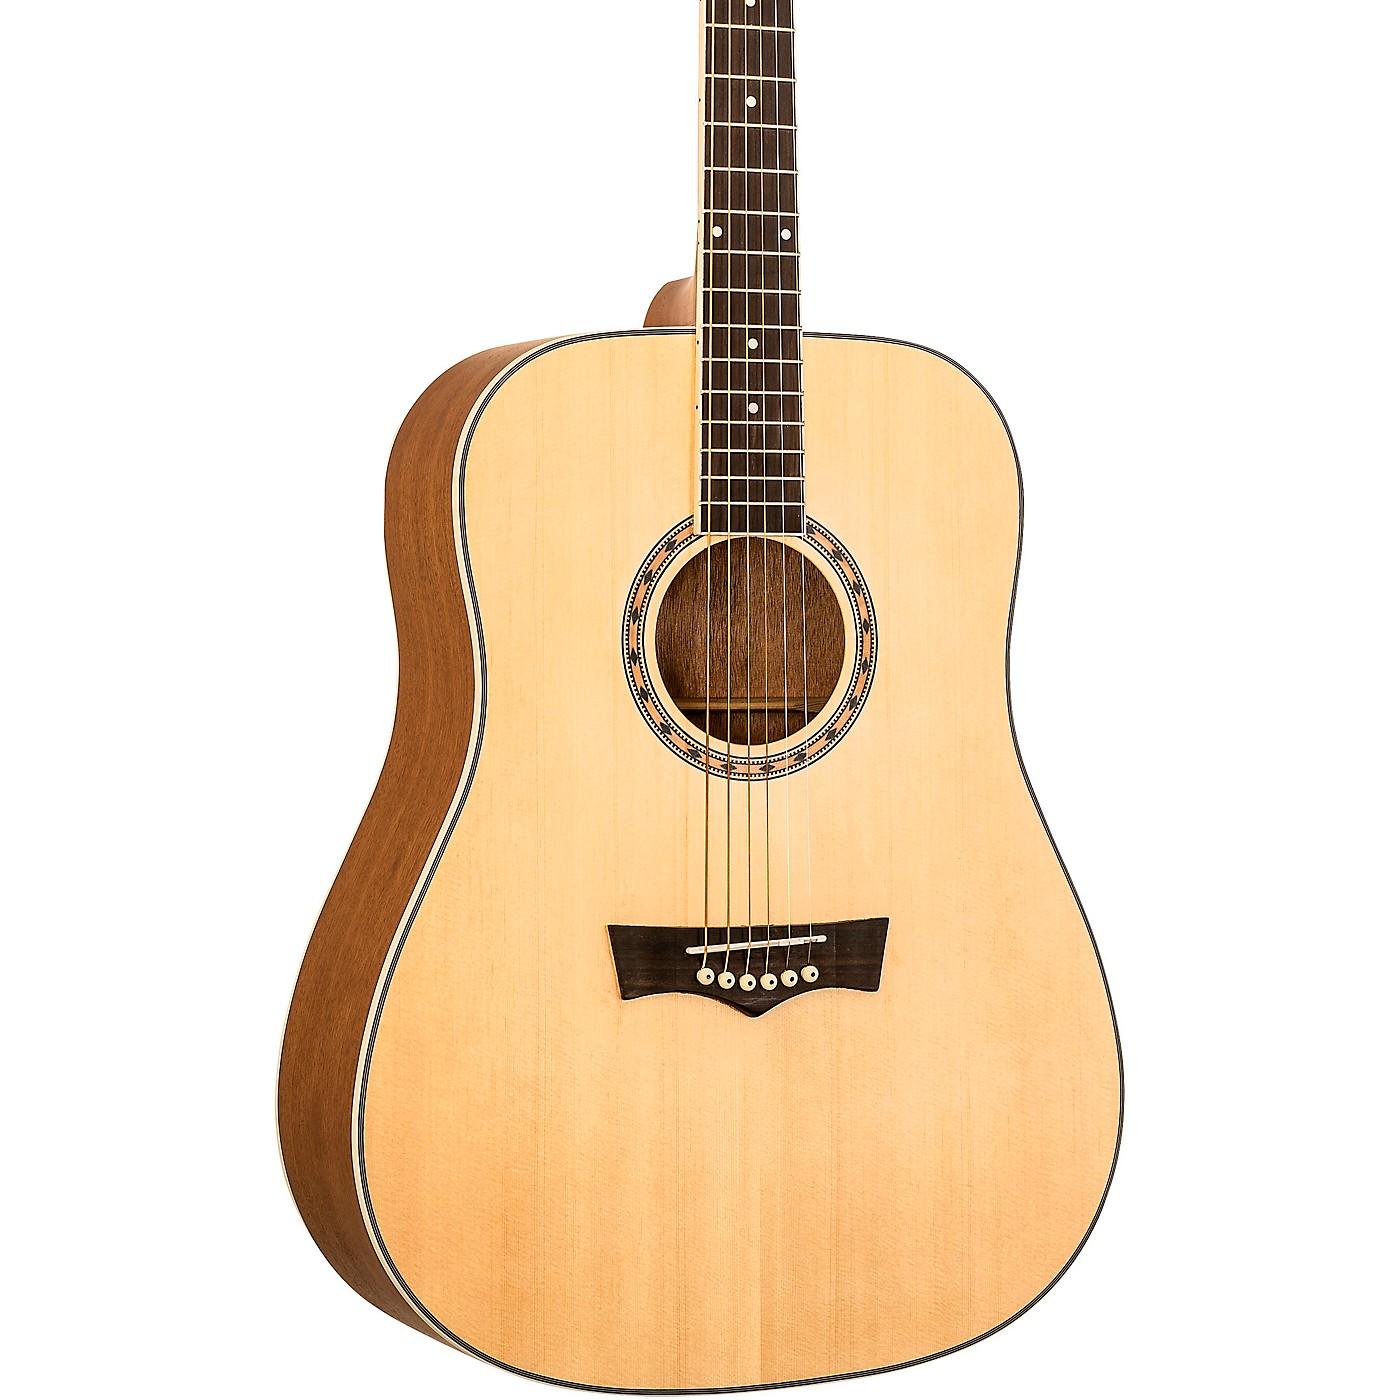 Peavey DW-1 Dreadnought Acoustic Guitar thumbnail